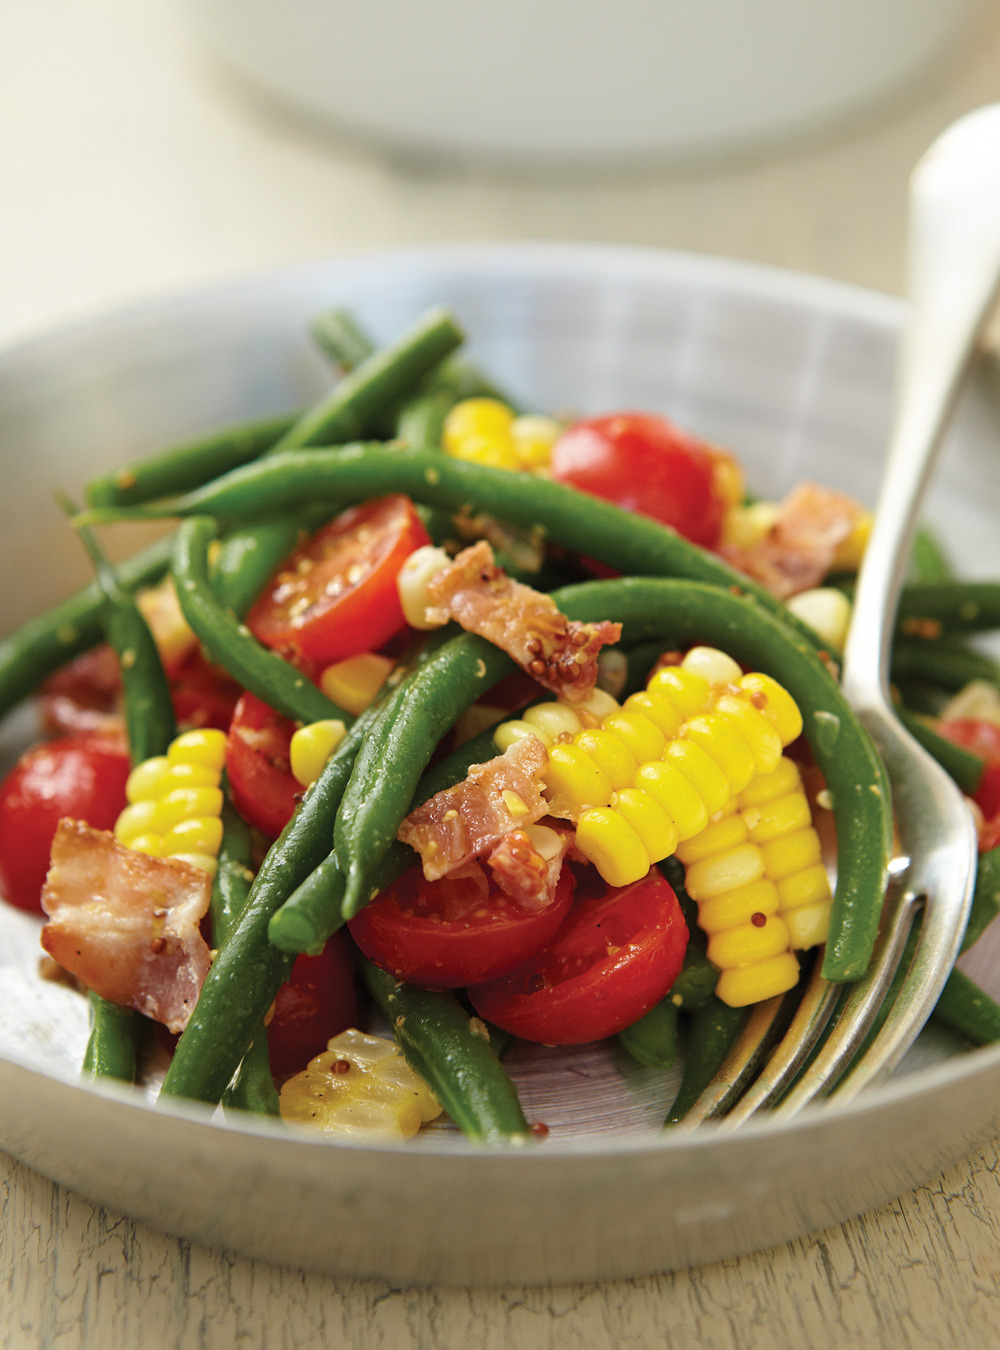 Salade de haricots verts et de ma s ricardo for Articles de cuisine de ricardo